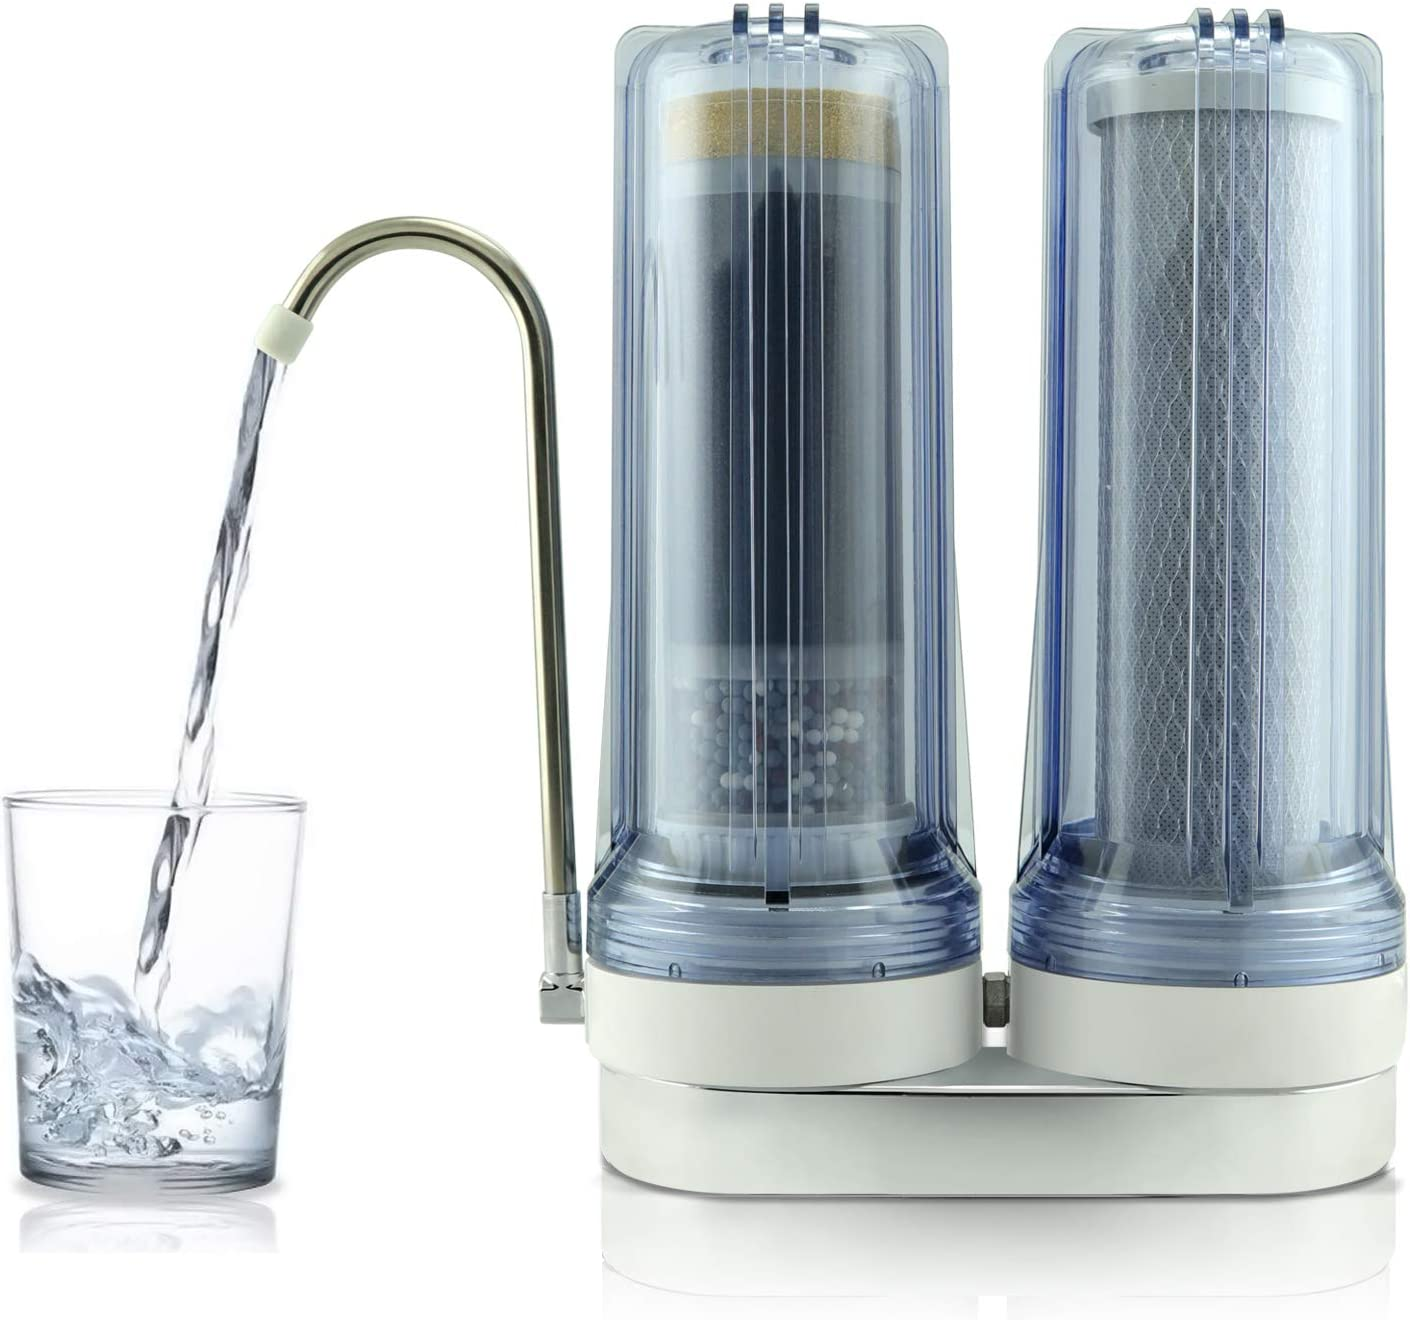 Apex. Exprt MR-2050 - Filtro de agua potable con doble encimera, 0 ...